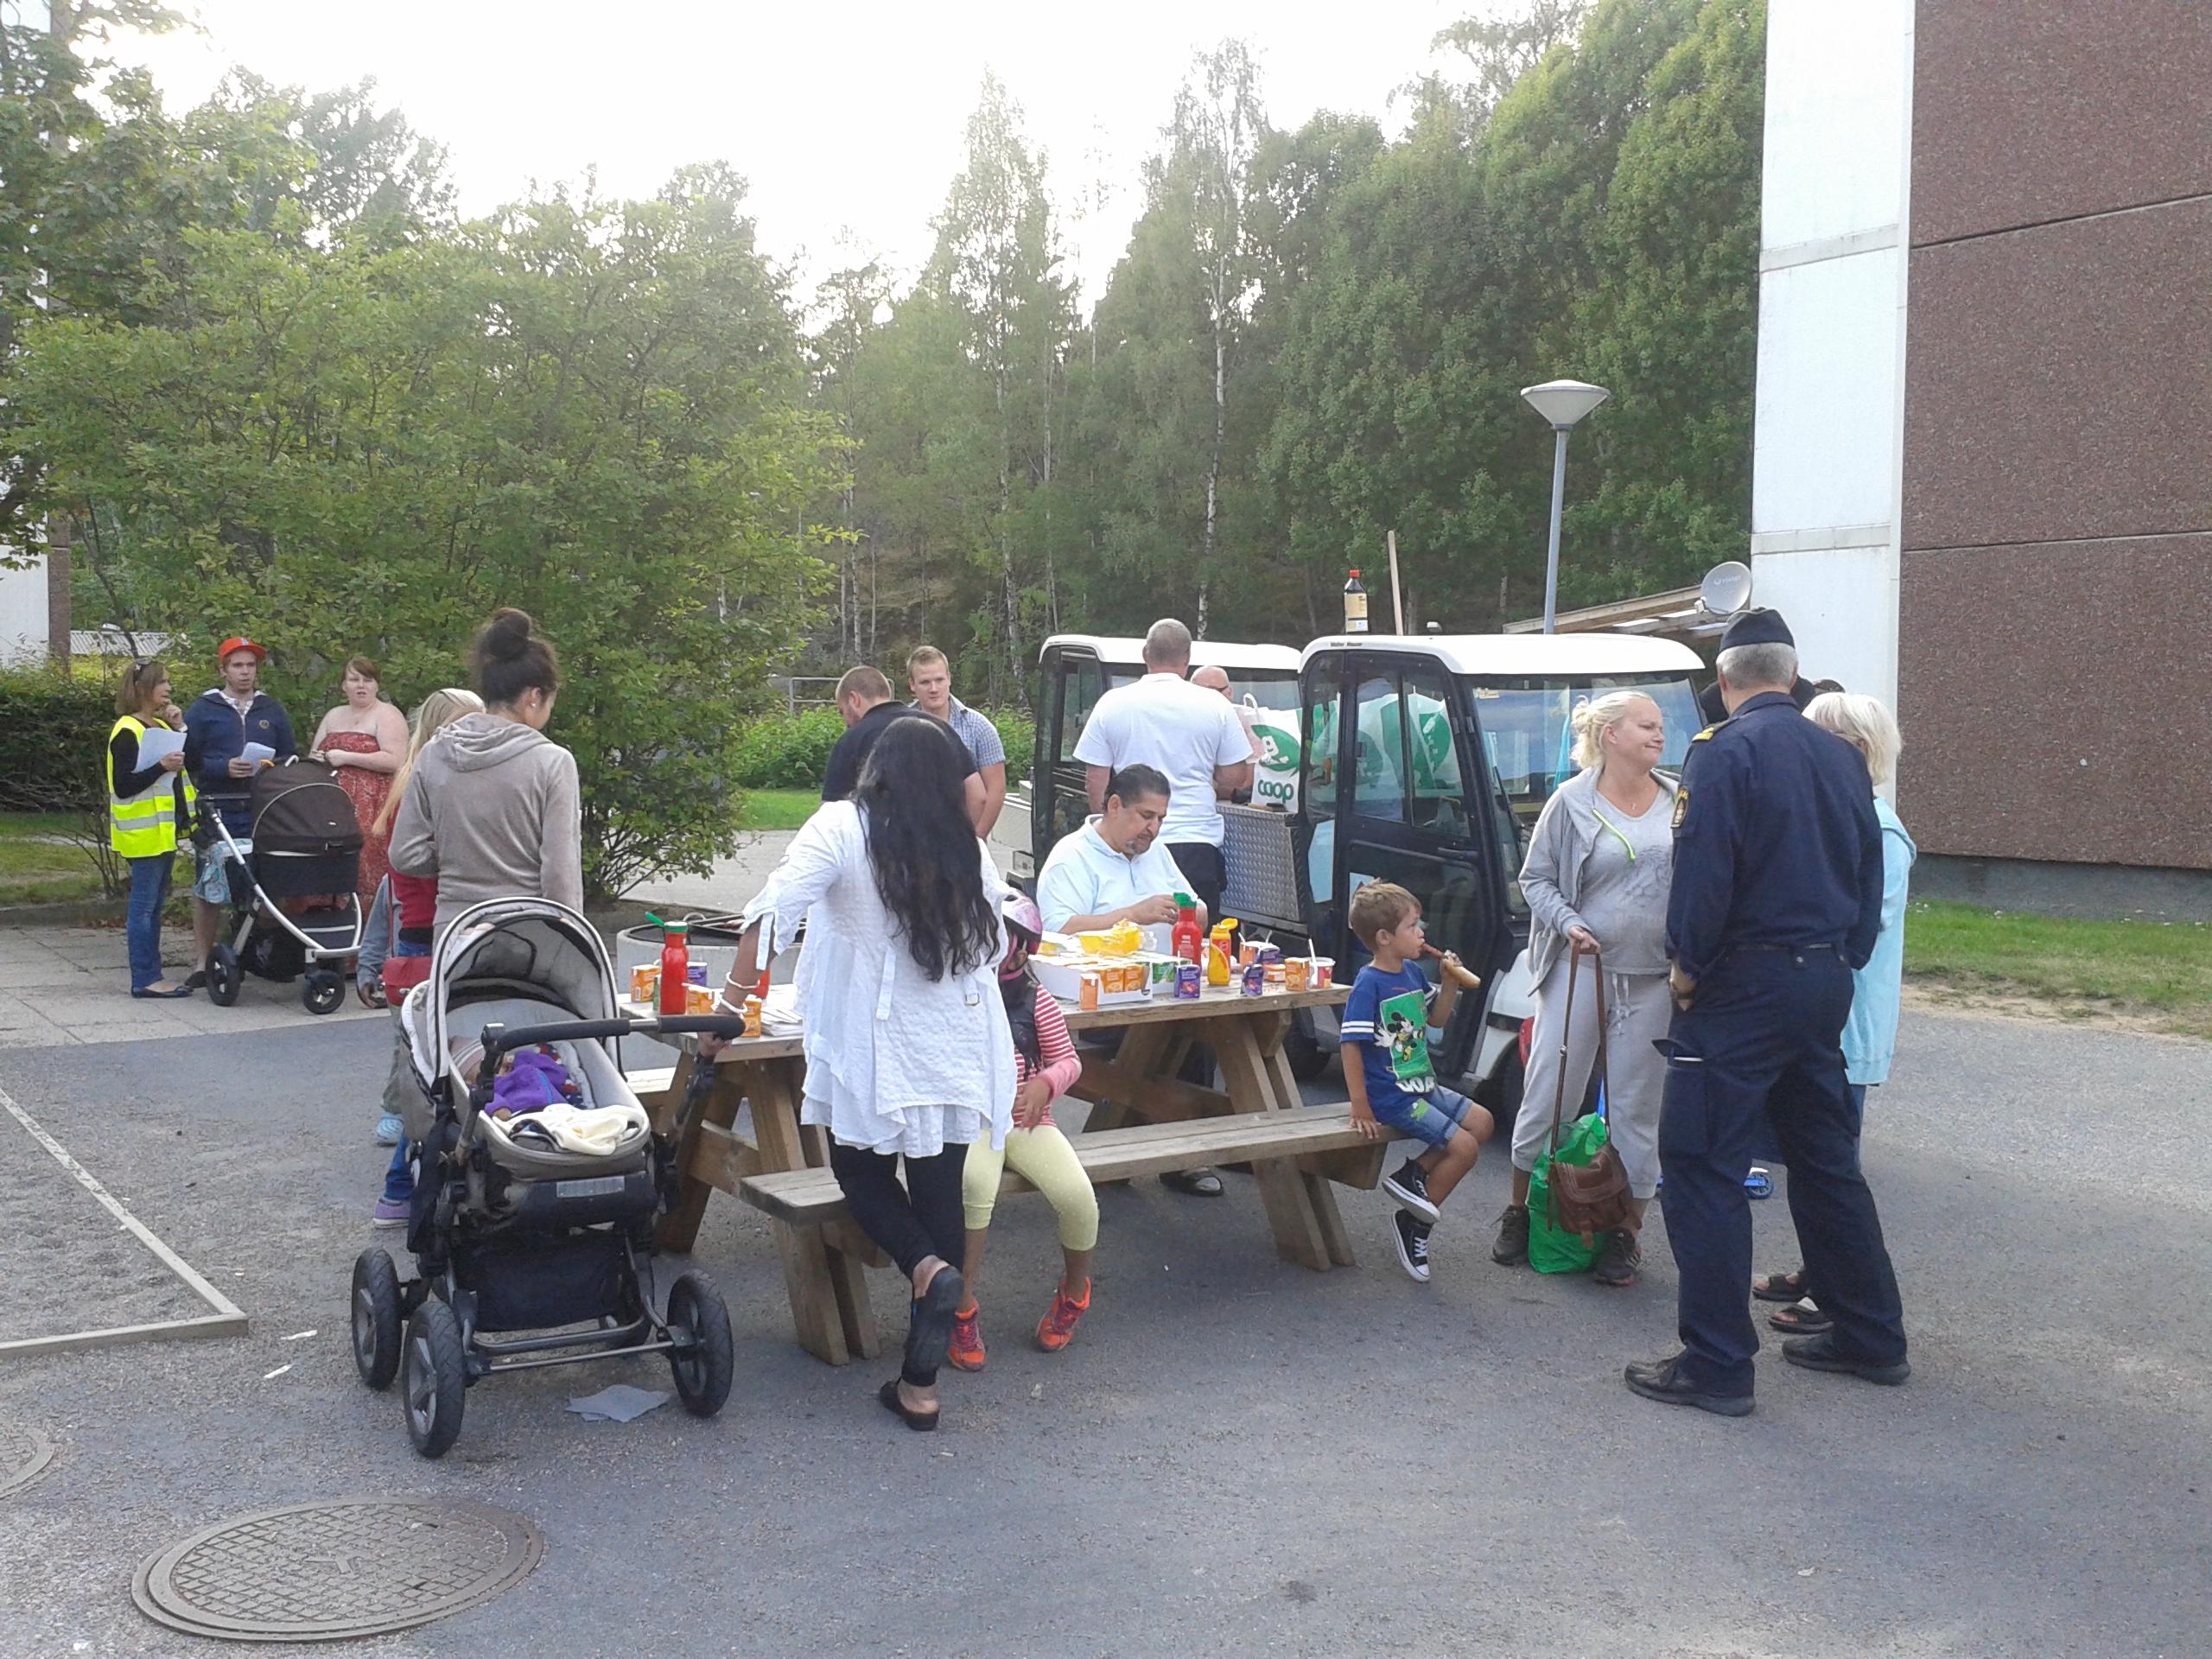 Jordbro 2014-08-14 020